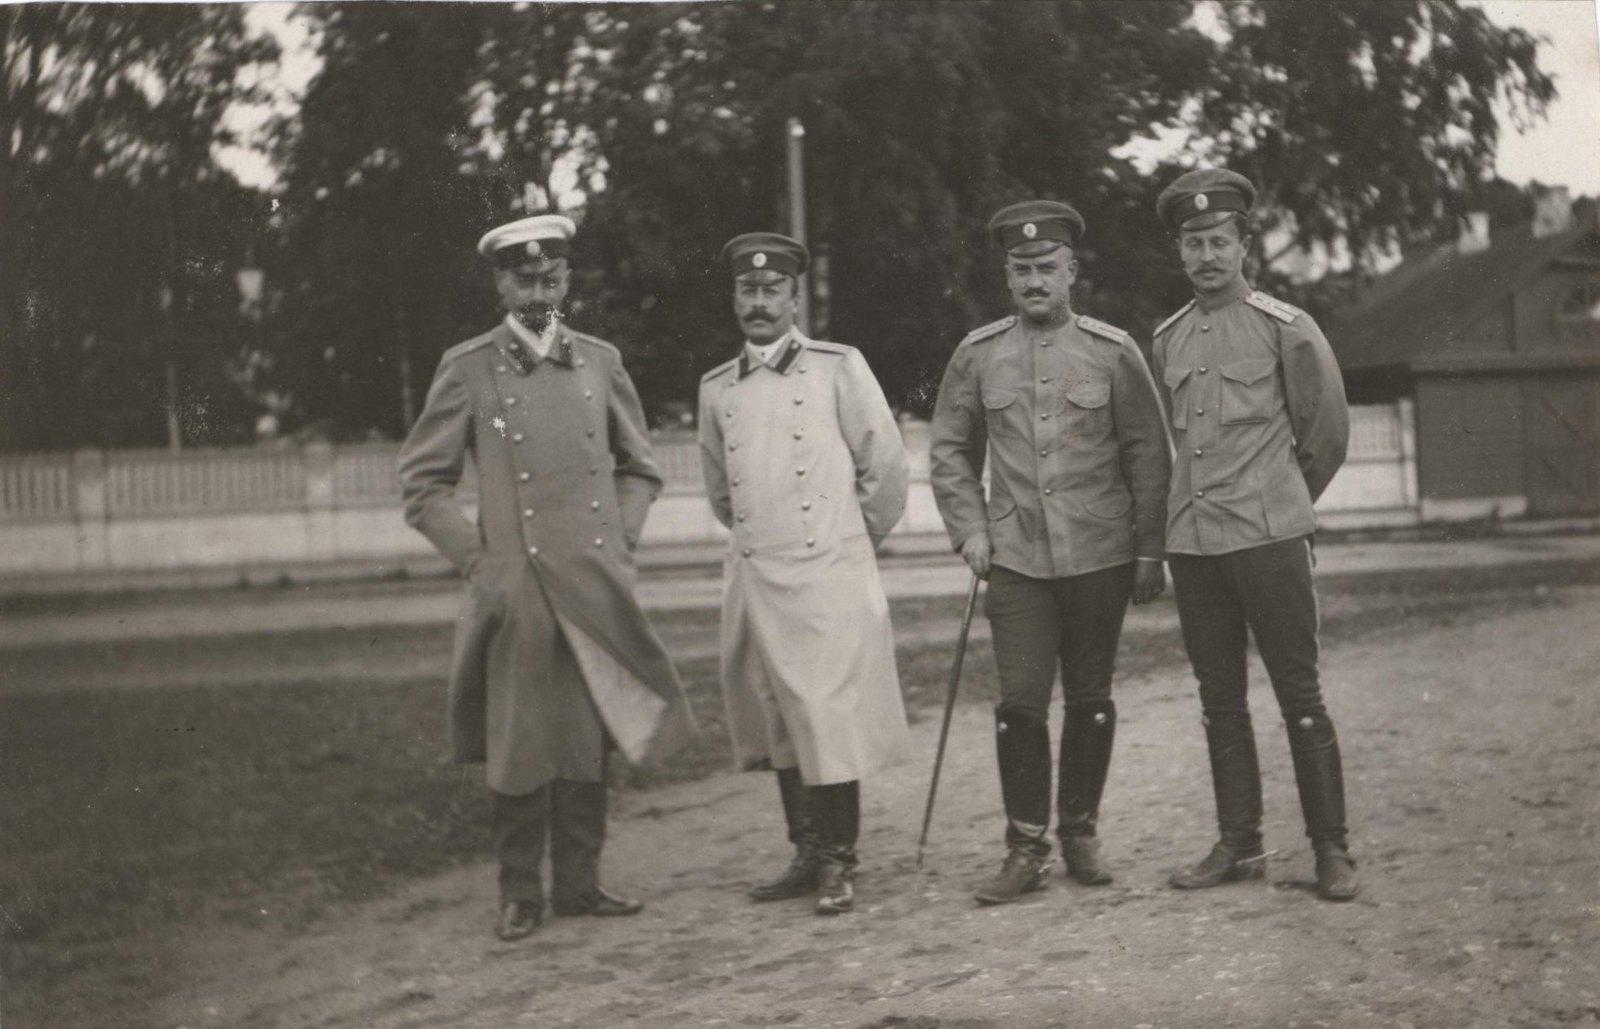 1909. Фредерикс, Маркозов, Смецкой, Греве